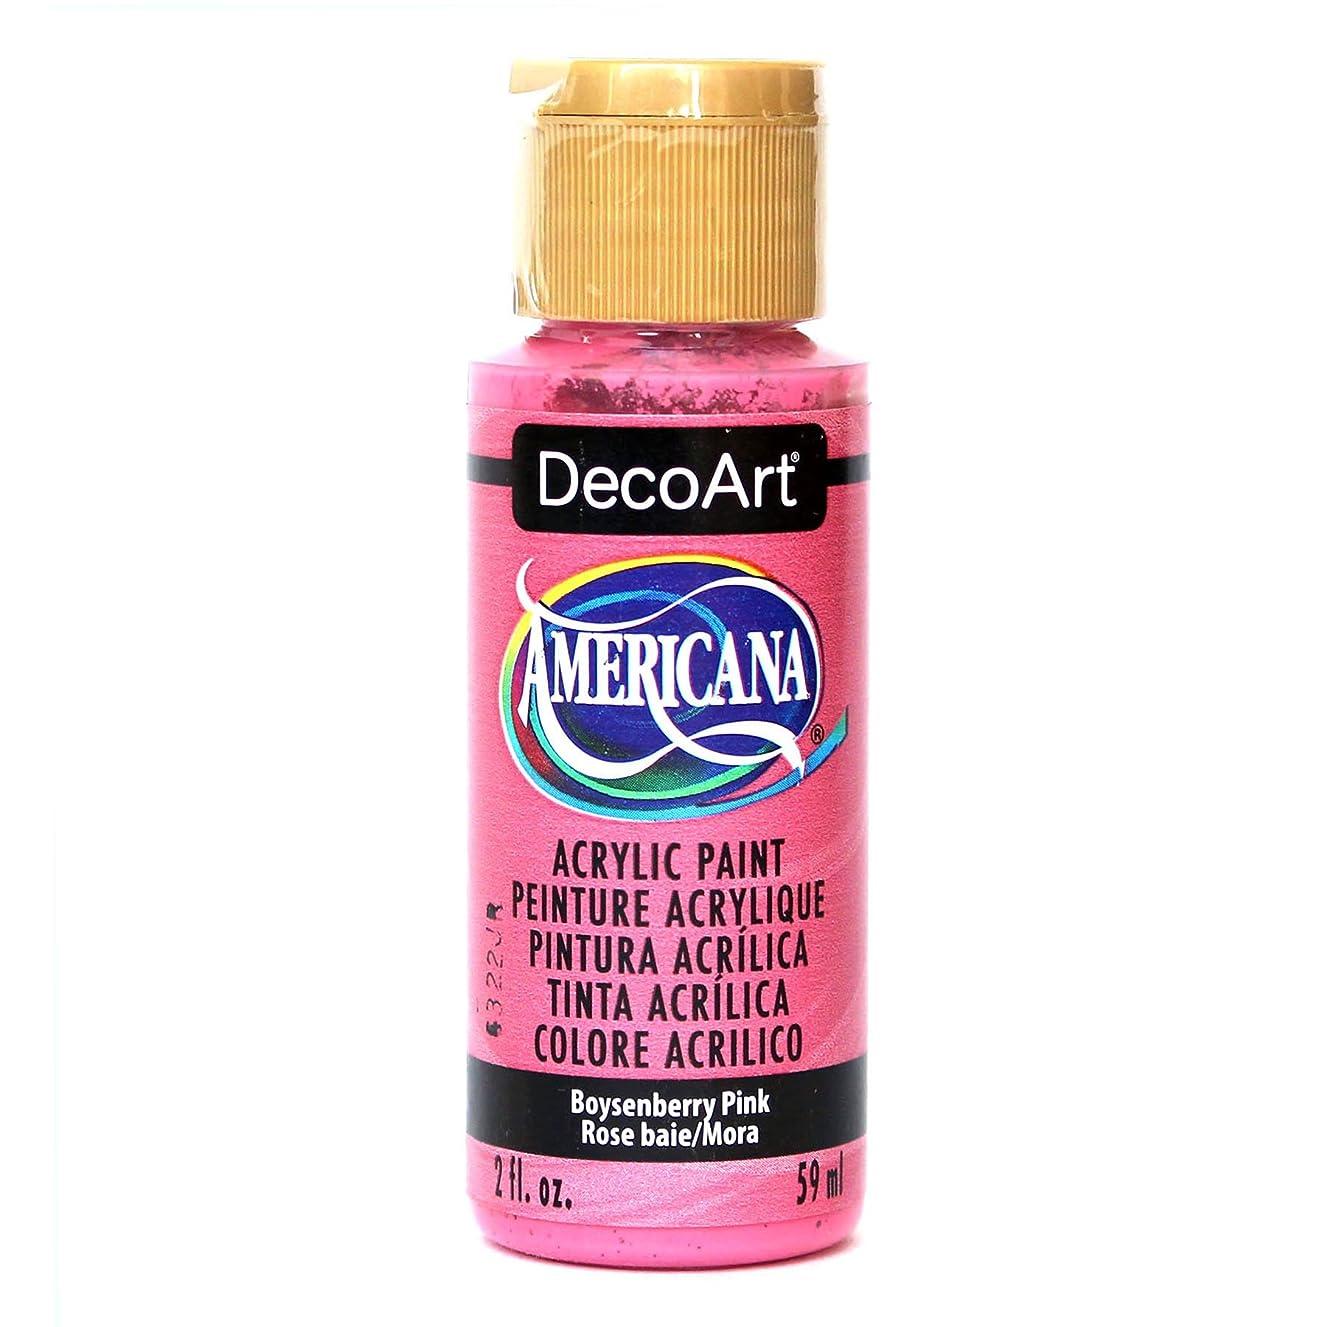 DecoArt Americana Acrylic Paint, 2-Ounce, Boysenberry Pink